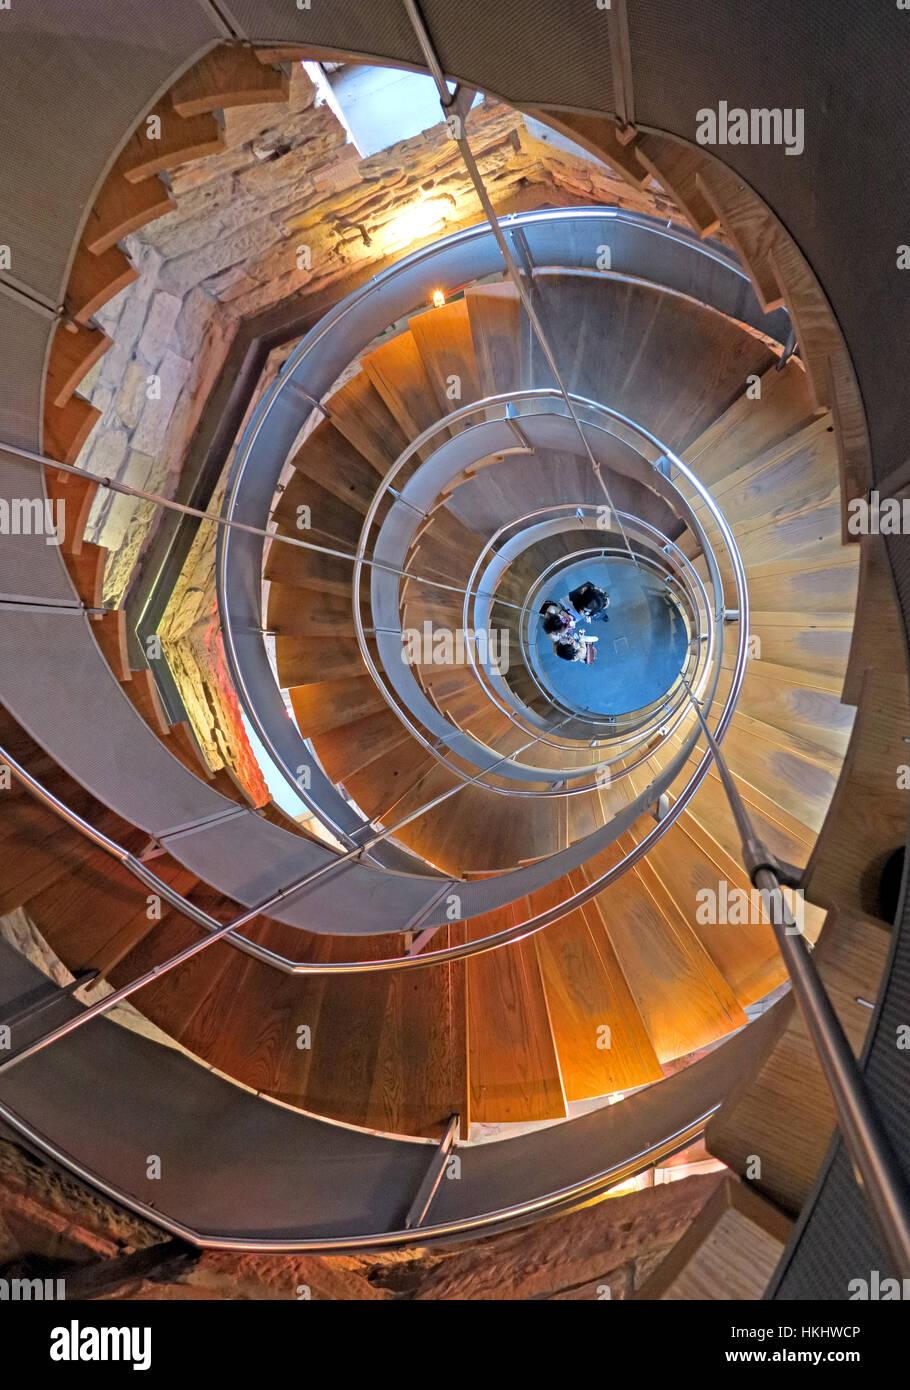 Glasgow,city,centre,gotonysmith,stairs,arts,artscentre,center